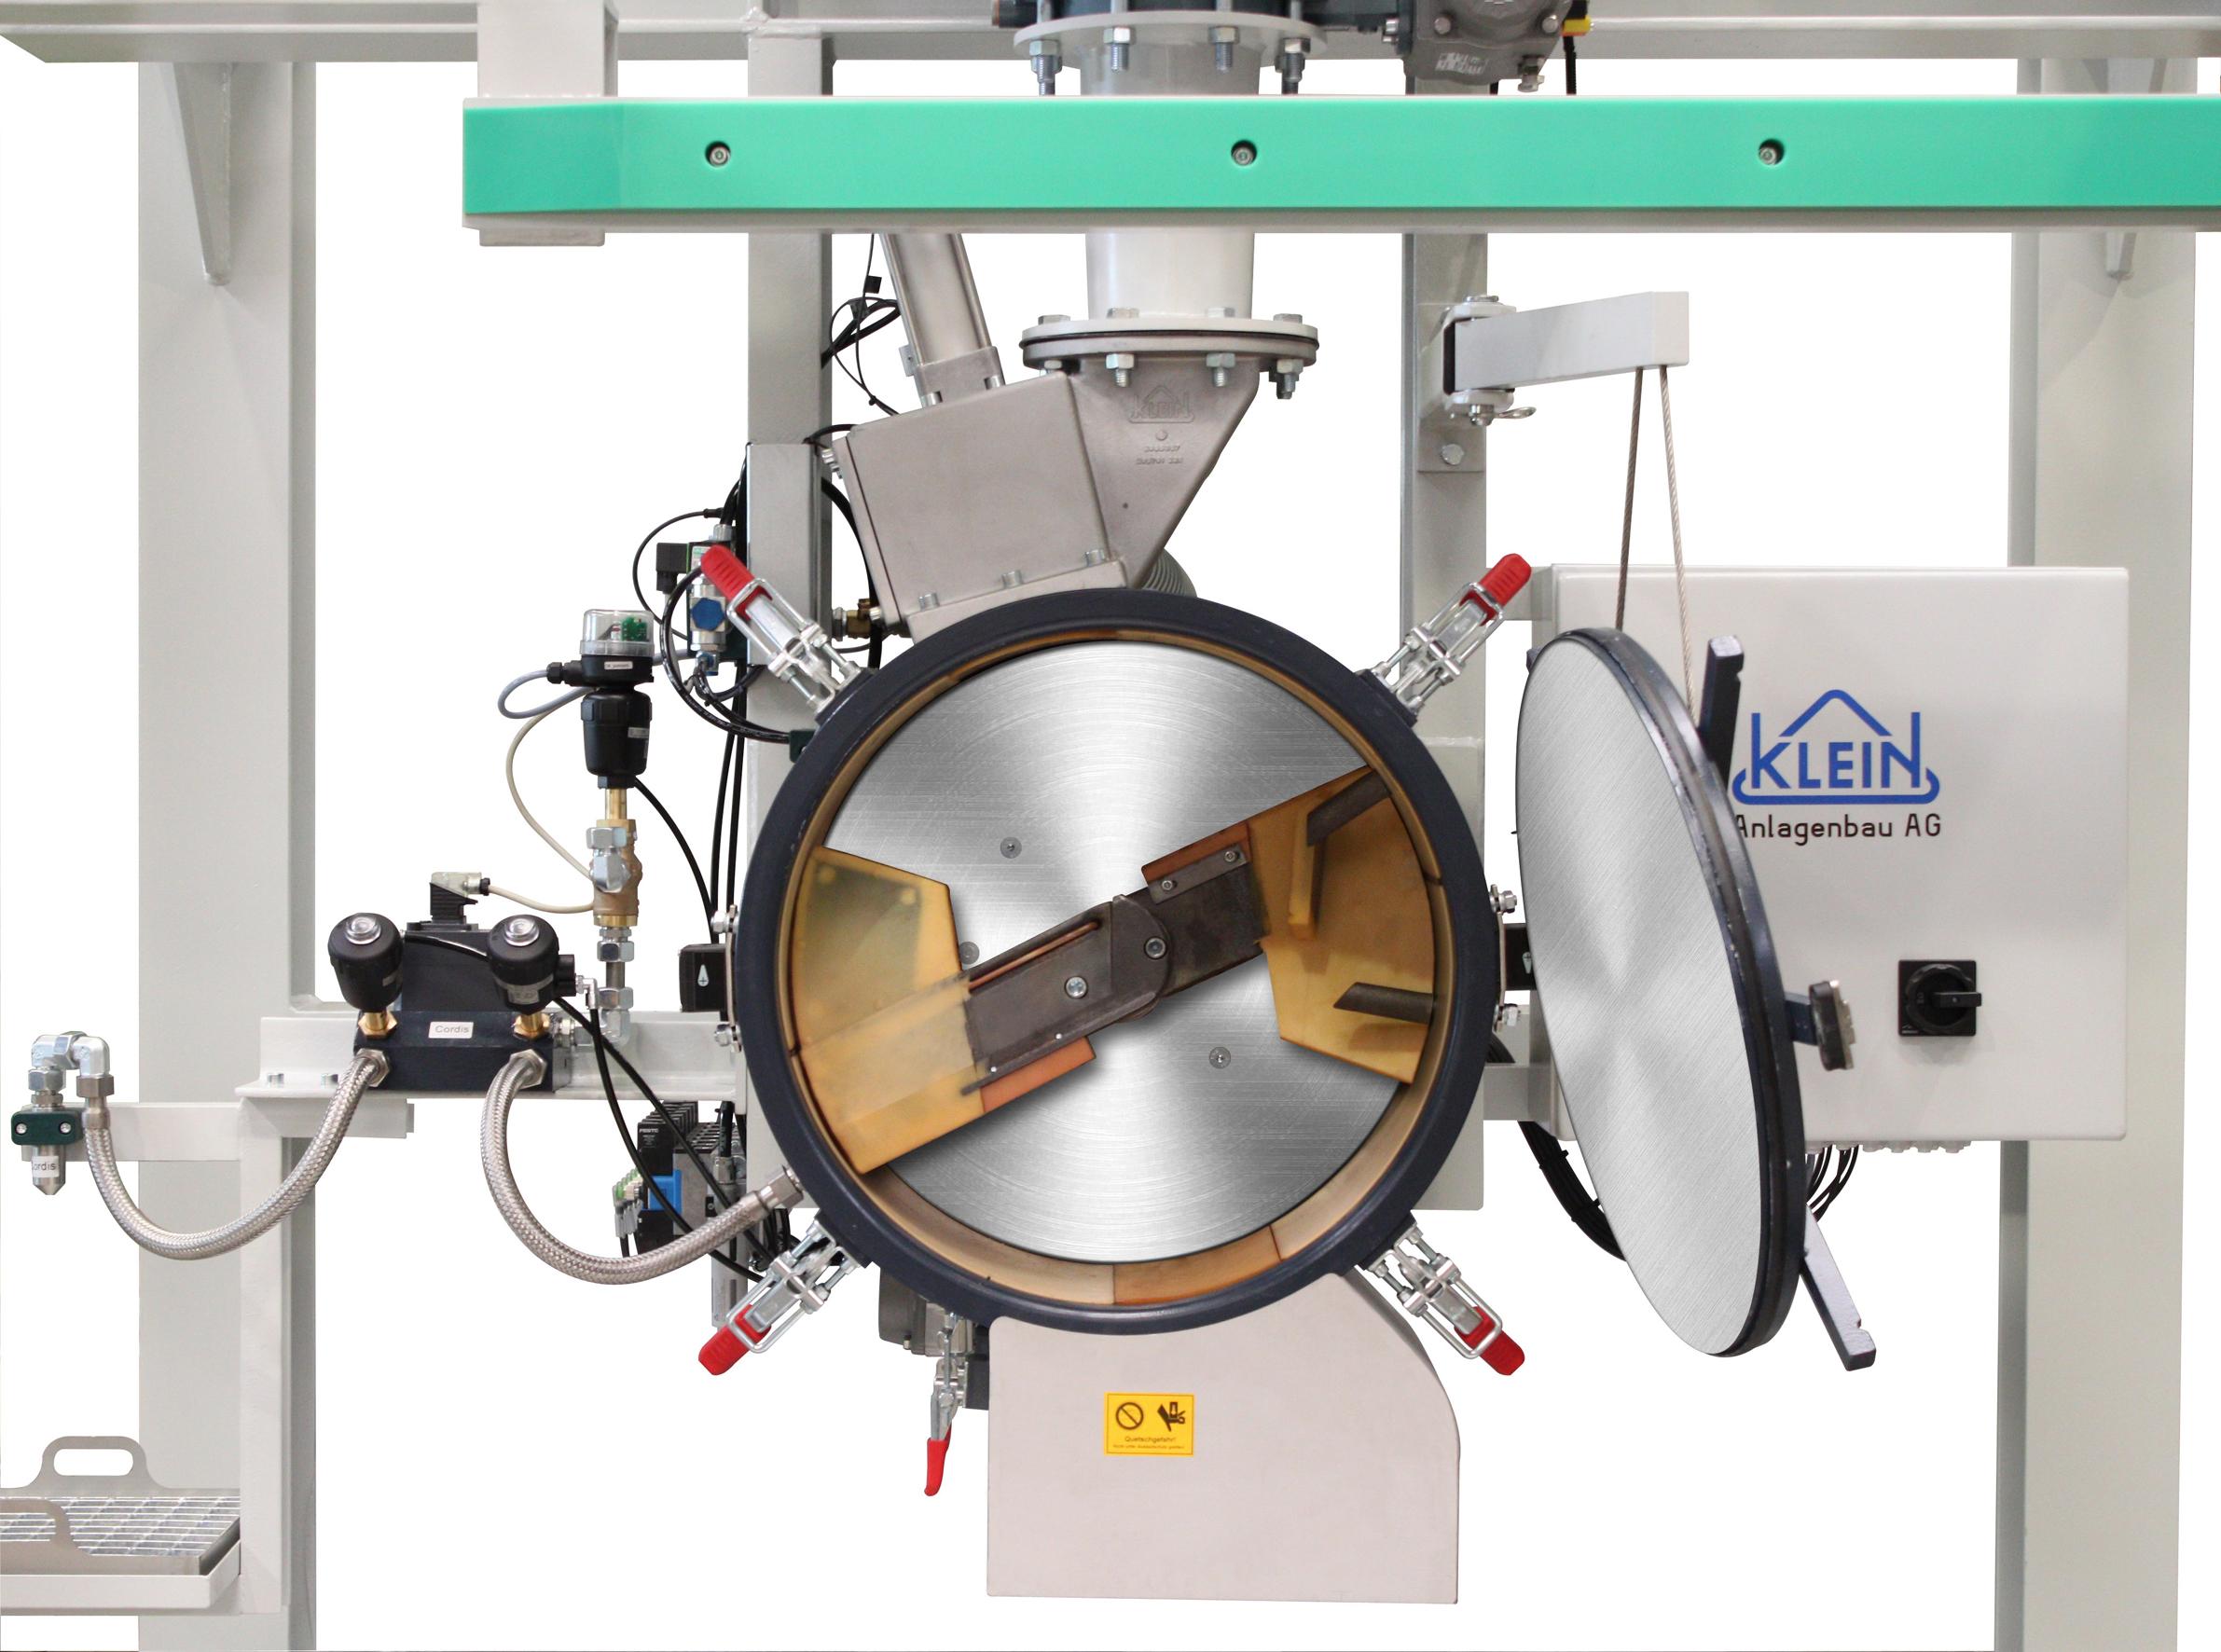 Fig. 1: Core sand mixer (KLEIN Anlagenbau AG)